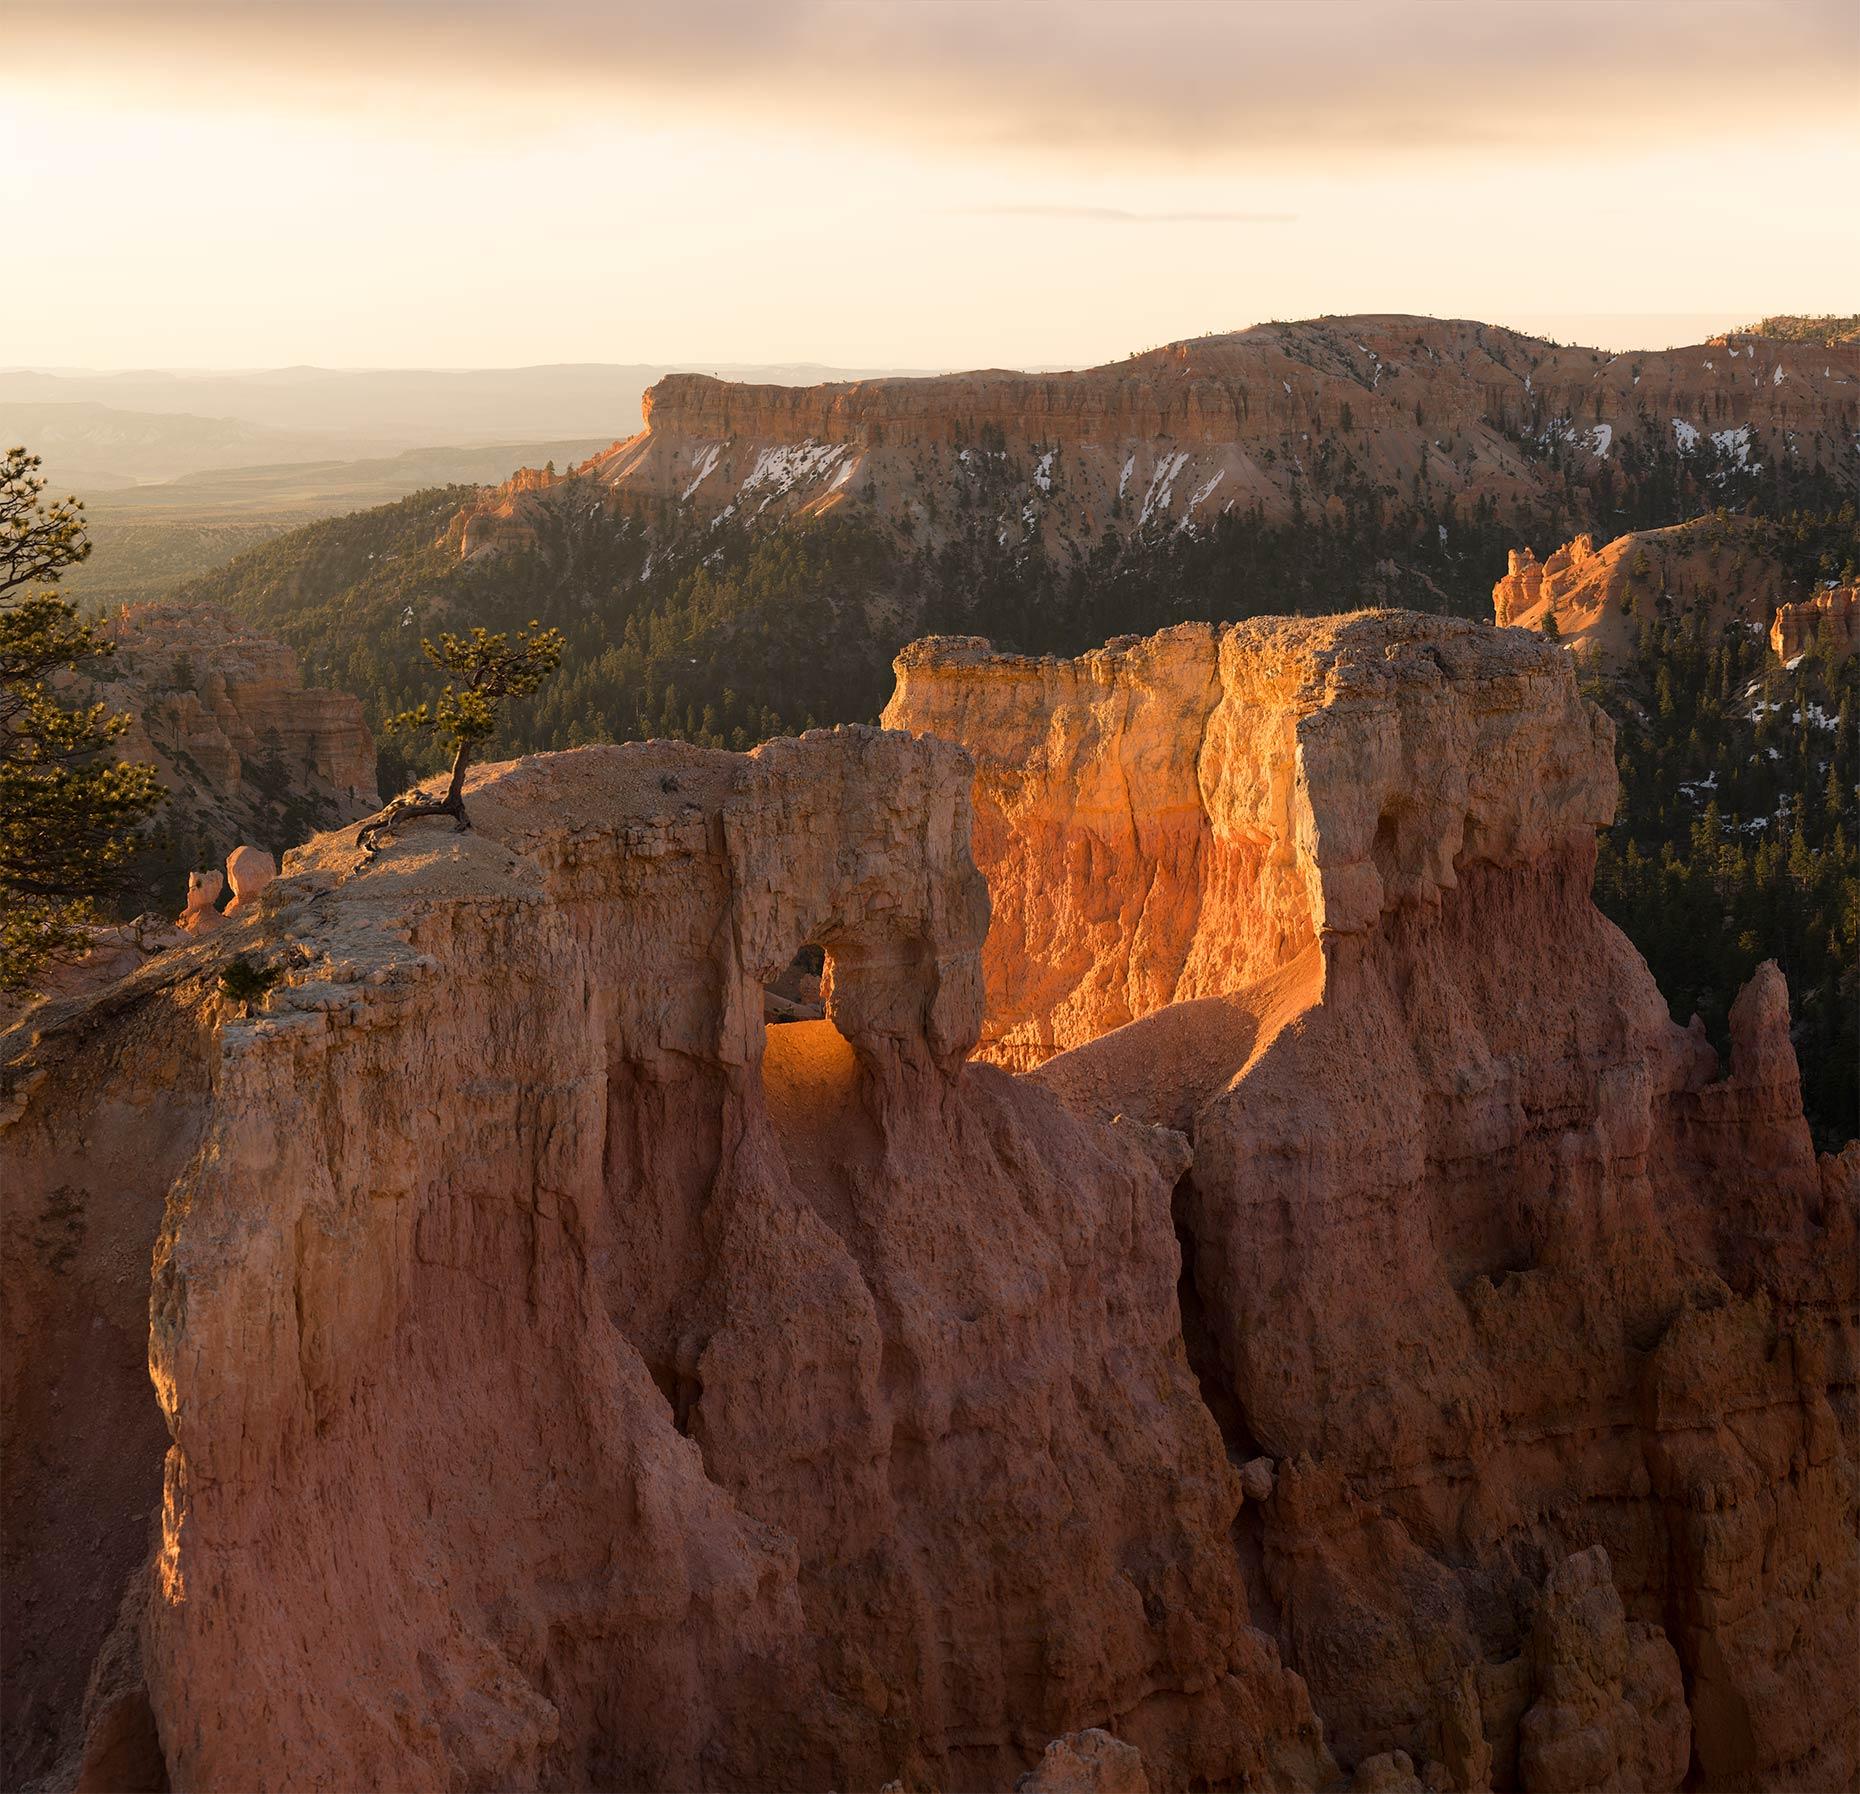 Lane_Peters_Multimedia_Bryce-Canyon2.jpg